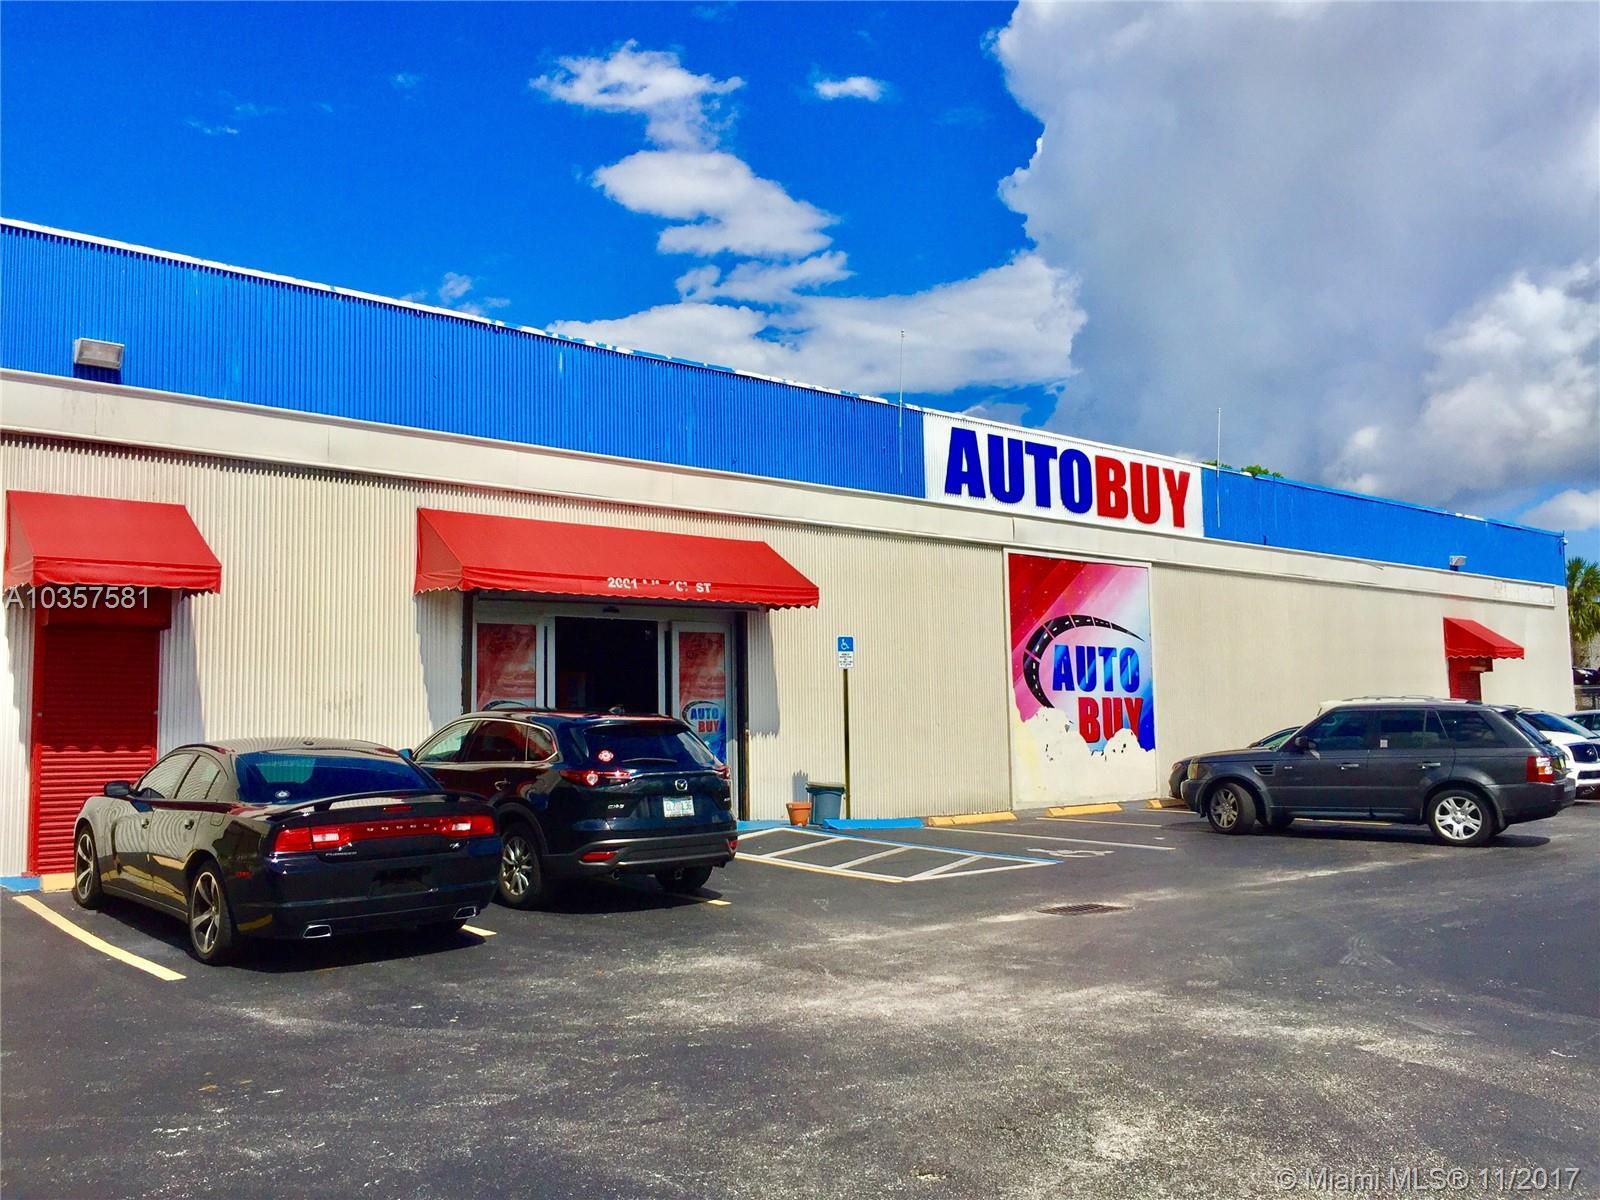 2001 NW 167th St, Miami Gardens, FL 33056